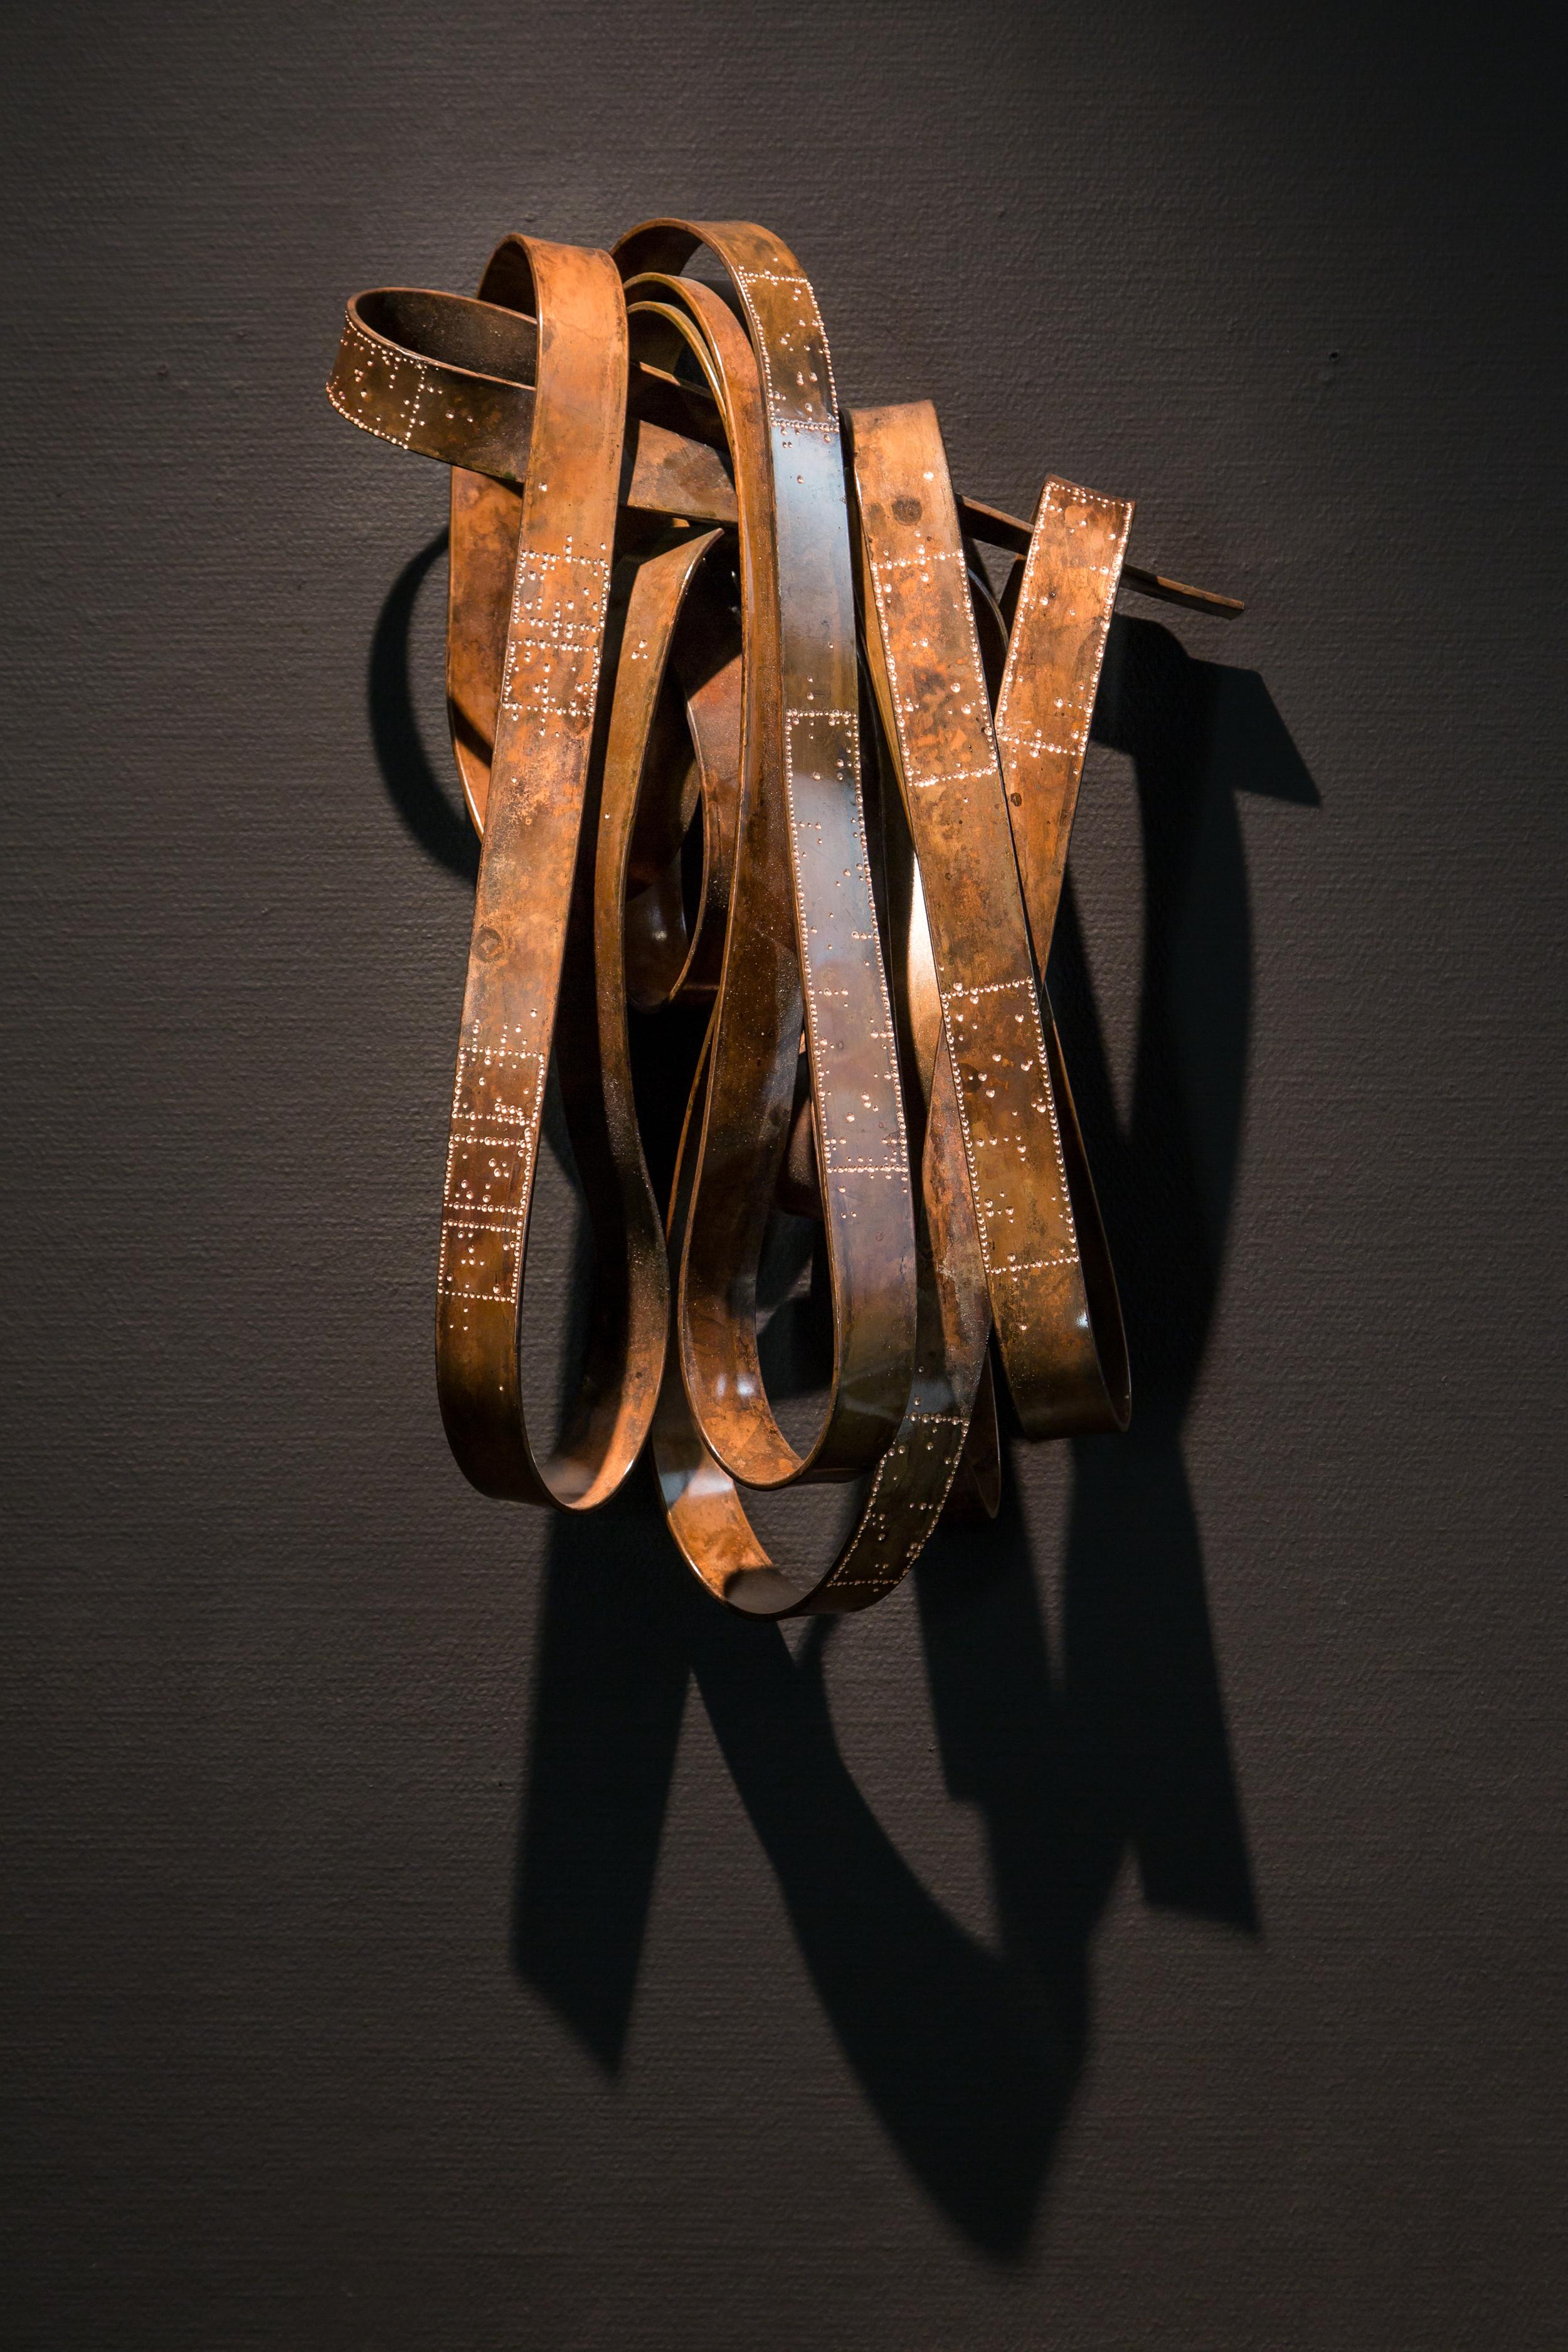 Oeuvre: Thierry Kupferschmid